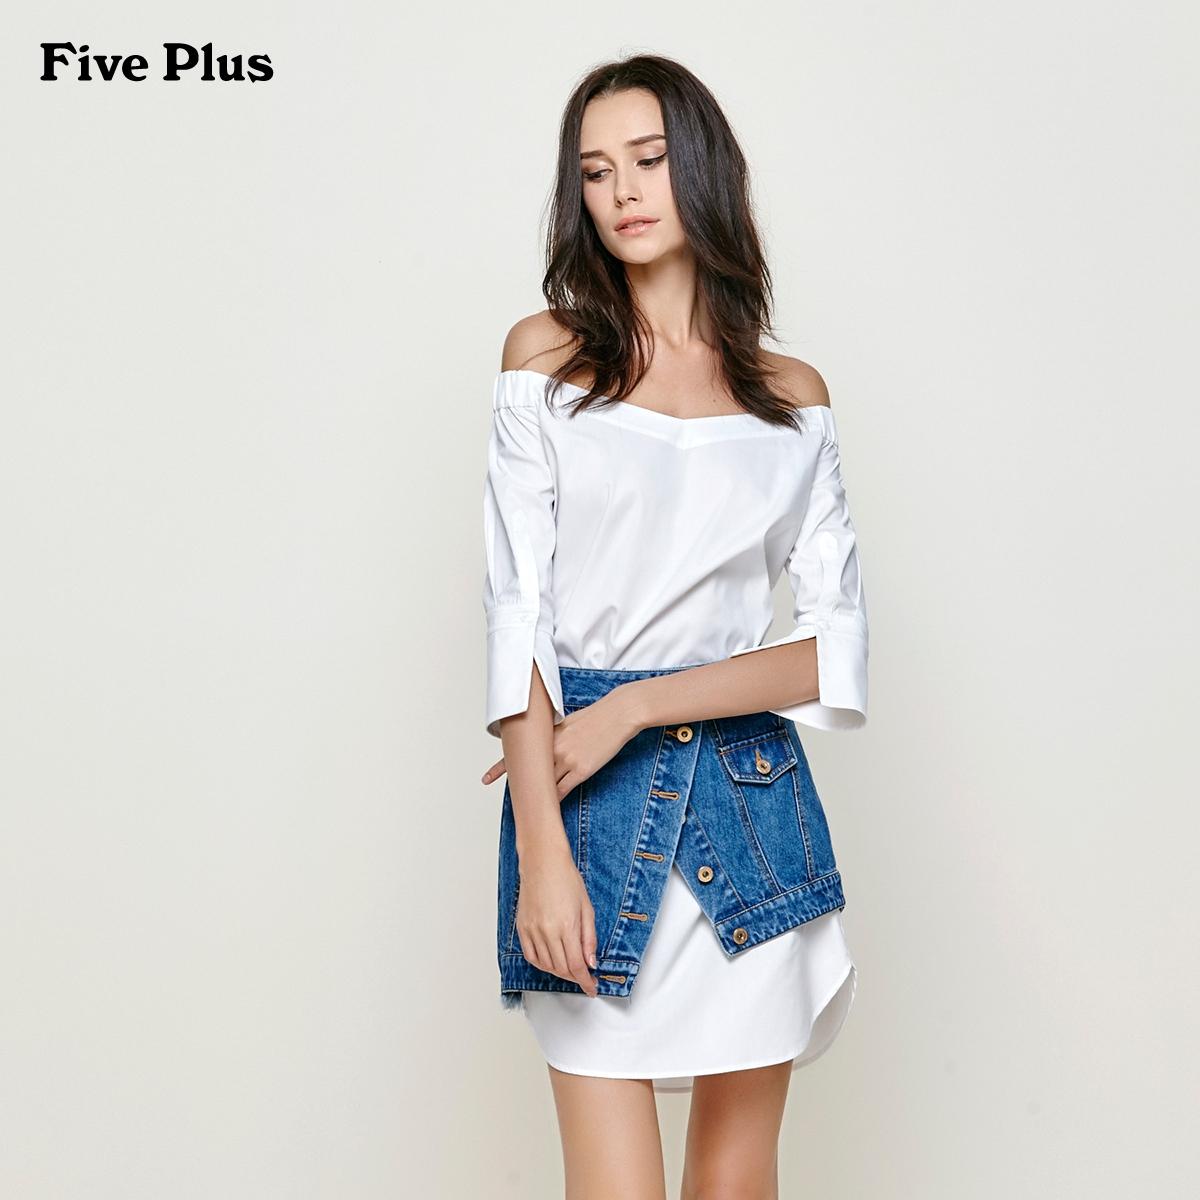 Five Plus新女夏装露肩连衣裙俏皮套装女两件套一字领衬衫裙宽松